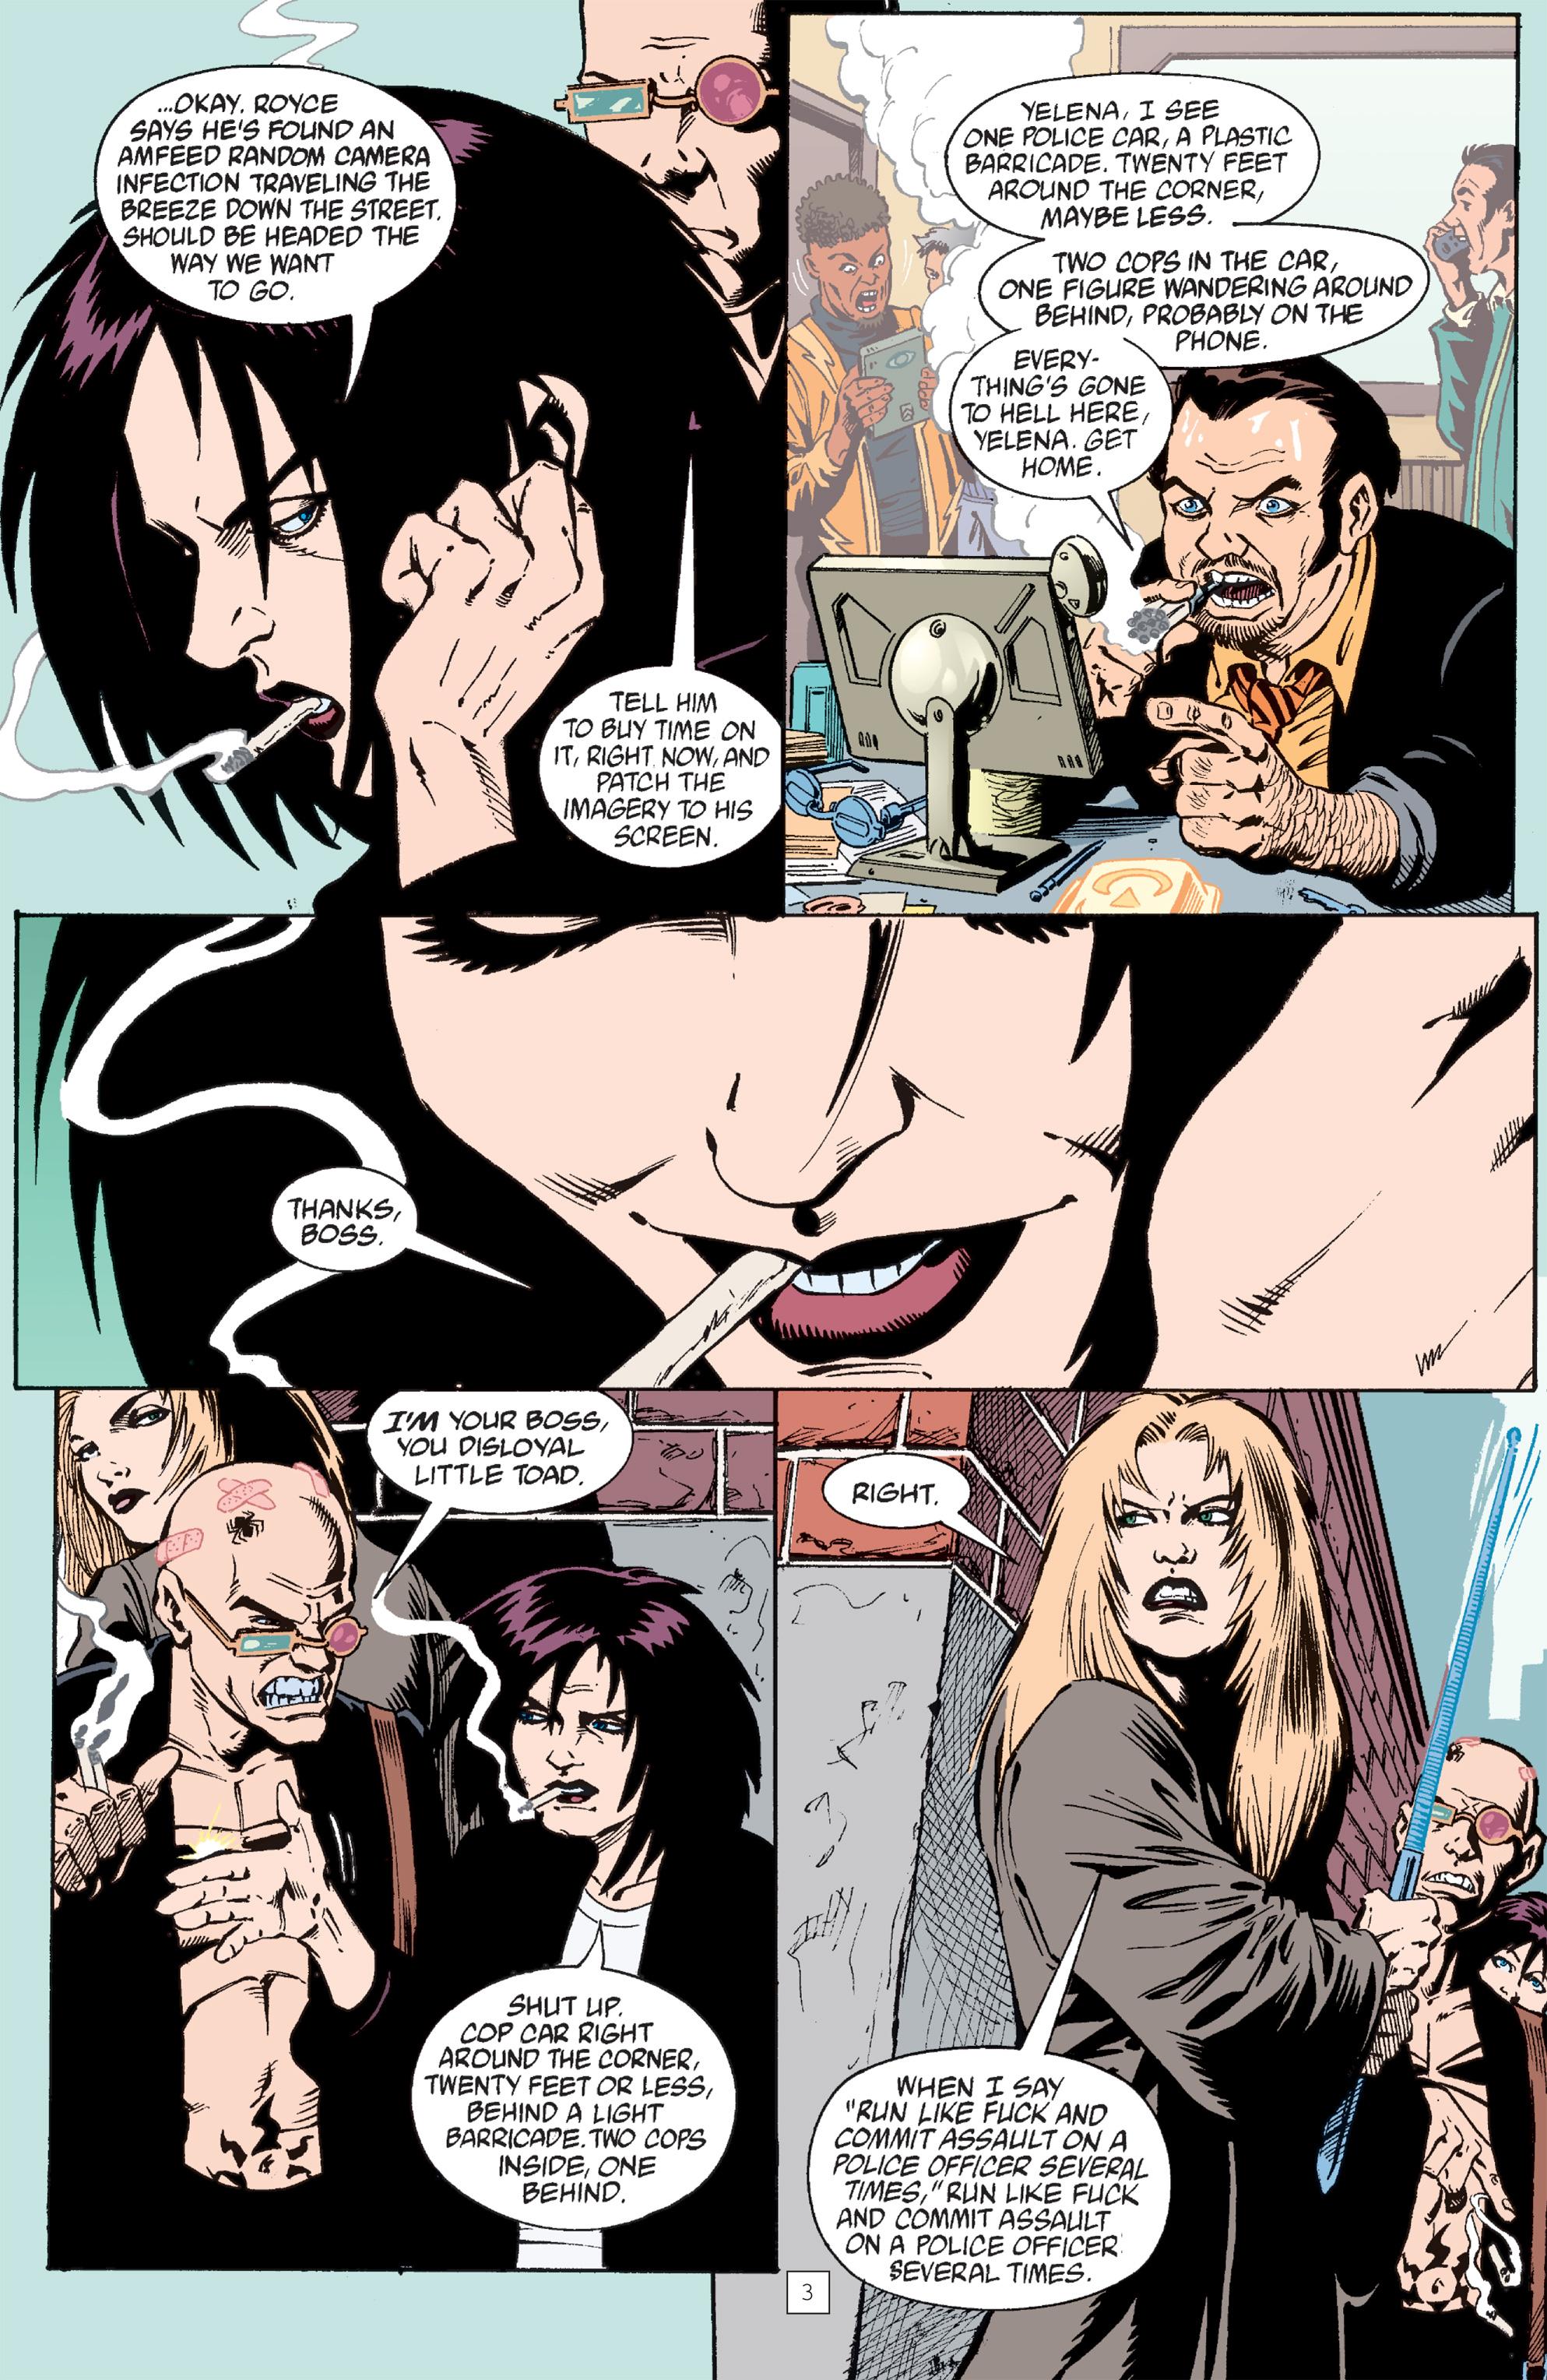 Read online Transmetropolitan comic -  Issue #30 - 4